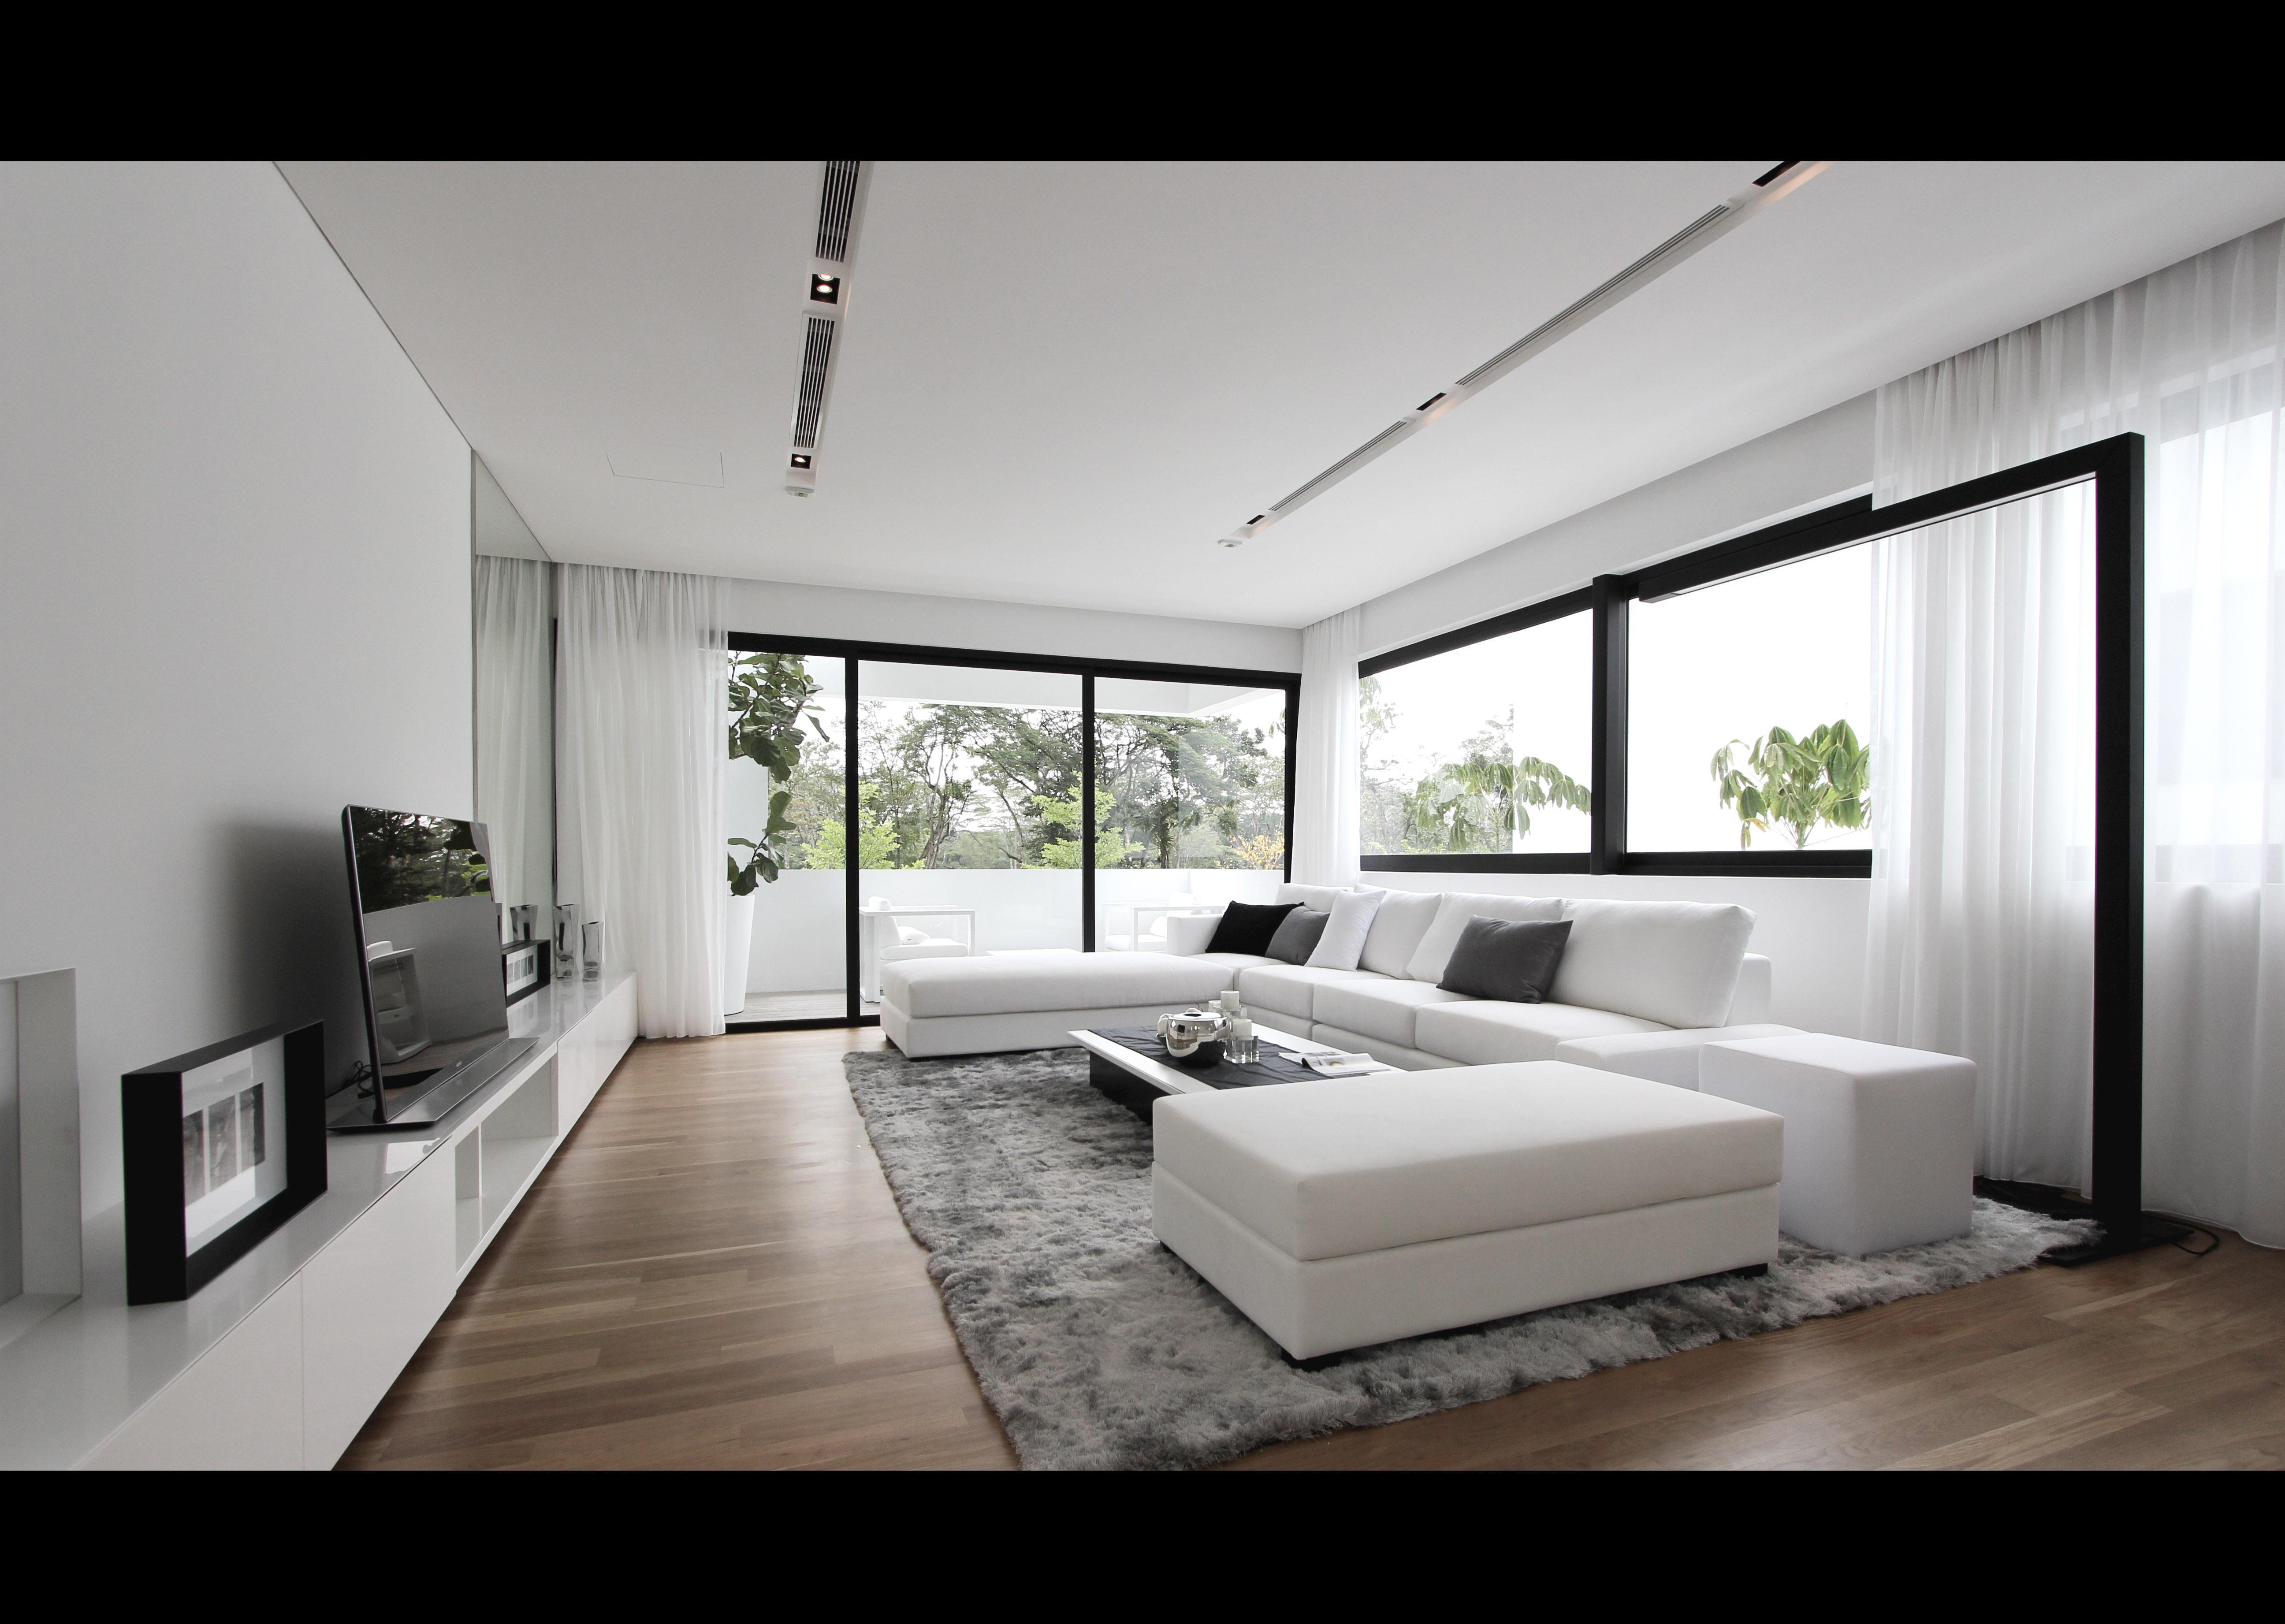 Plot 1 - Living Room